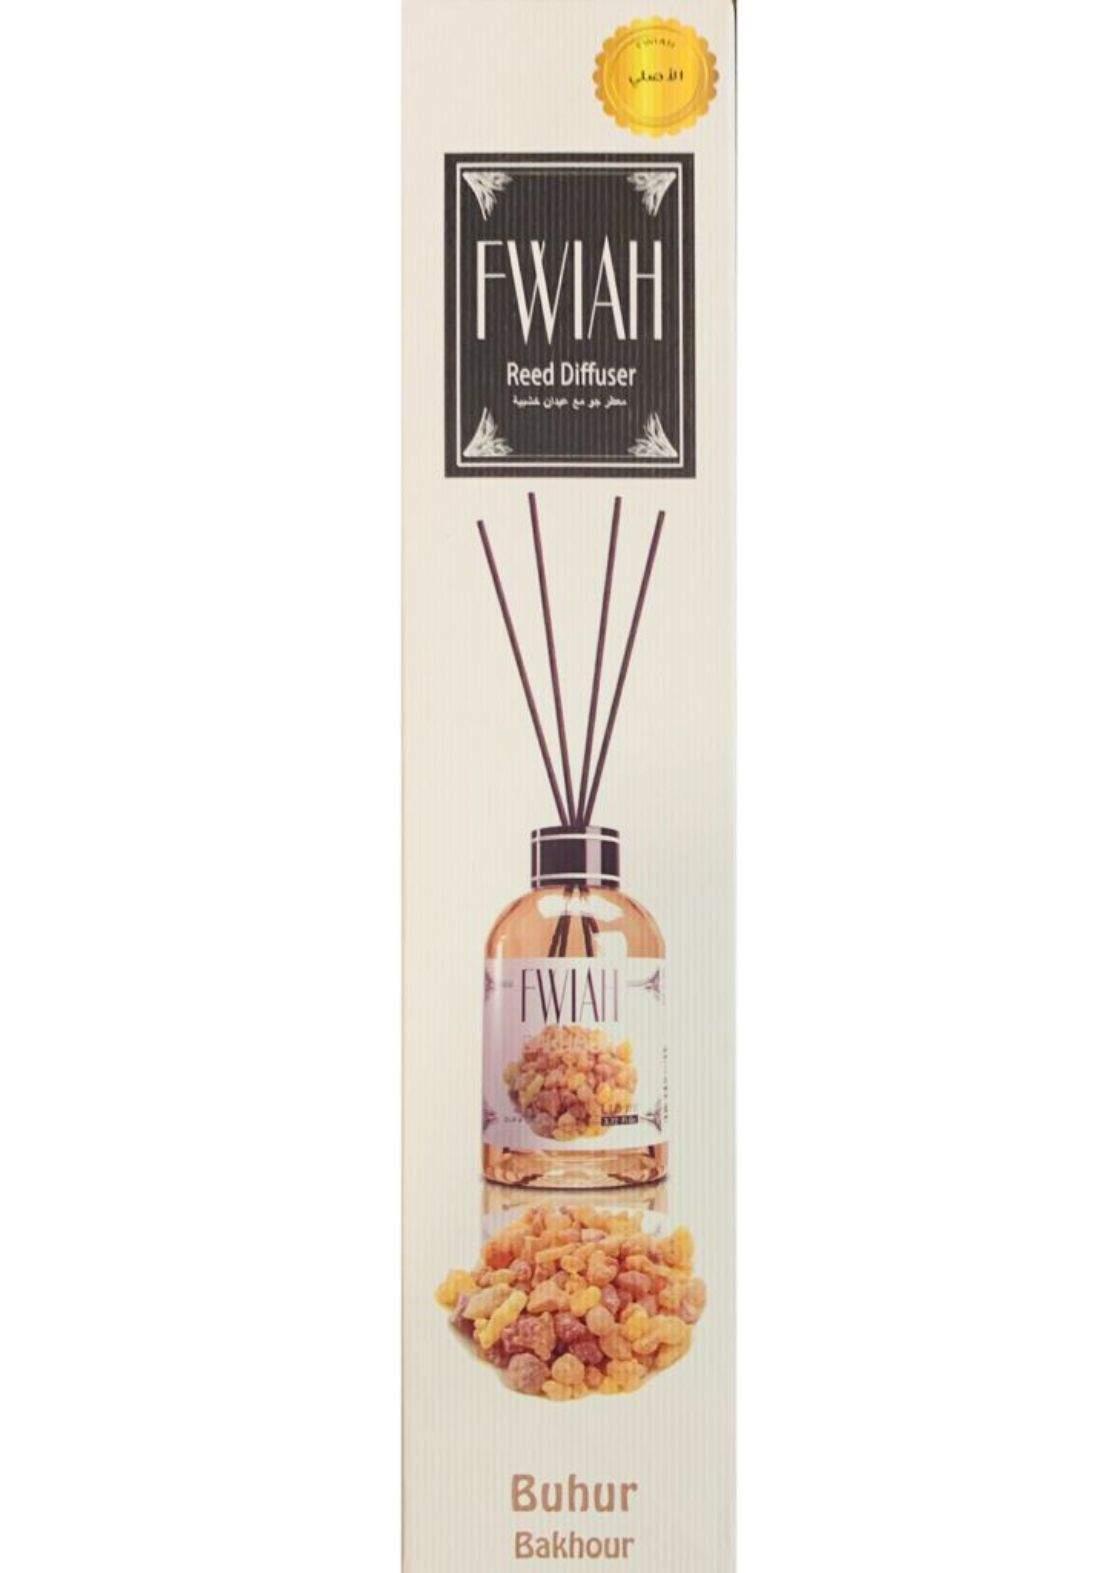 Fawah reed diffuser فواح معطر جو مع عيدان خشبية